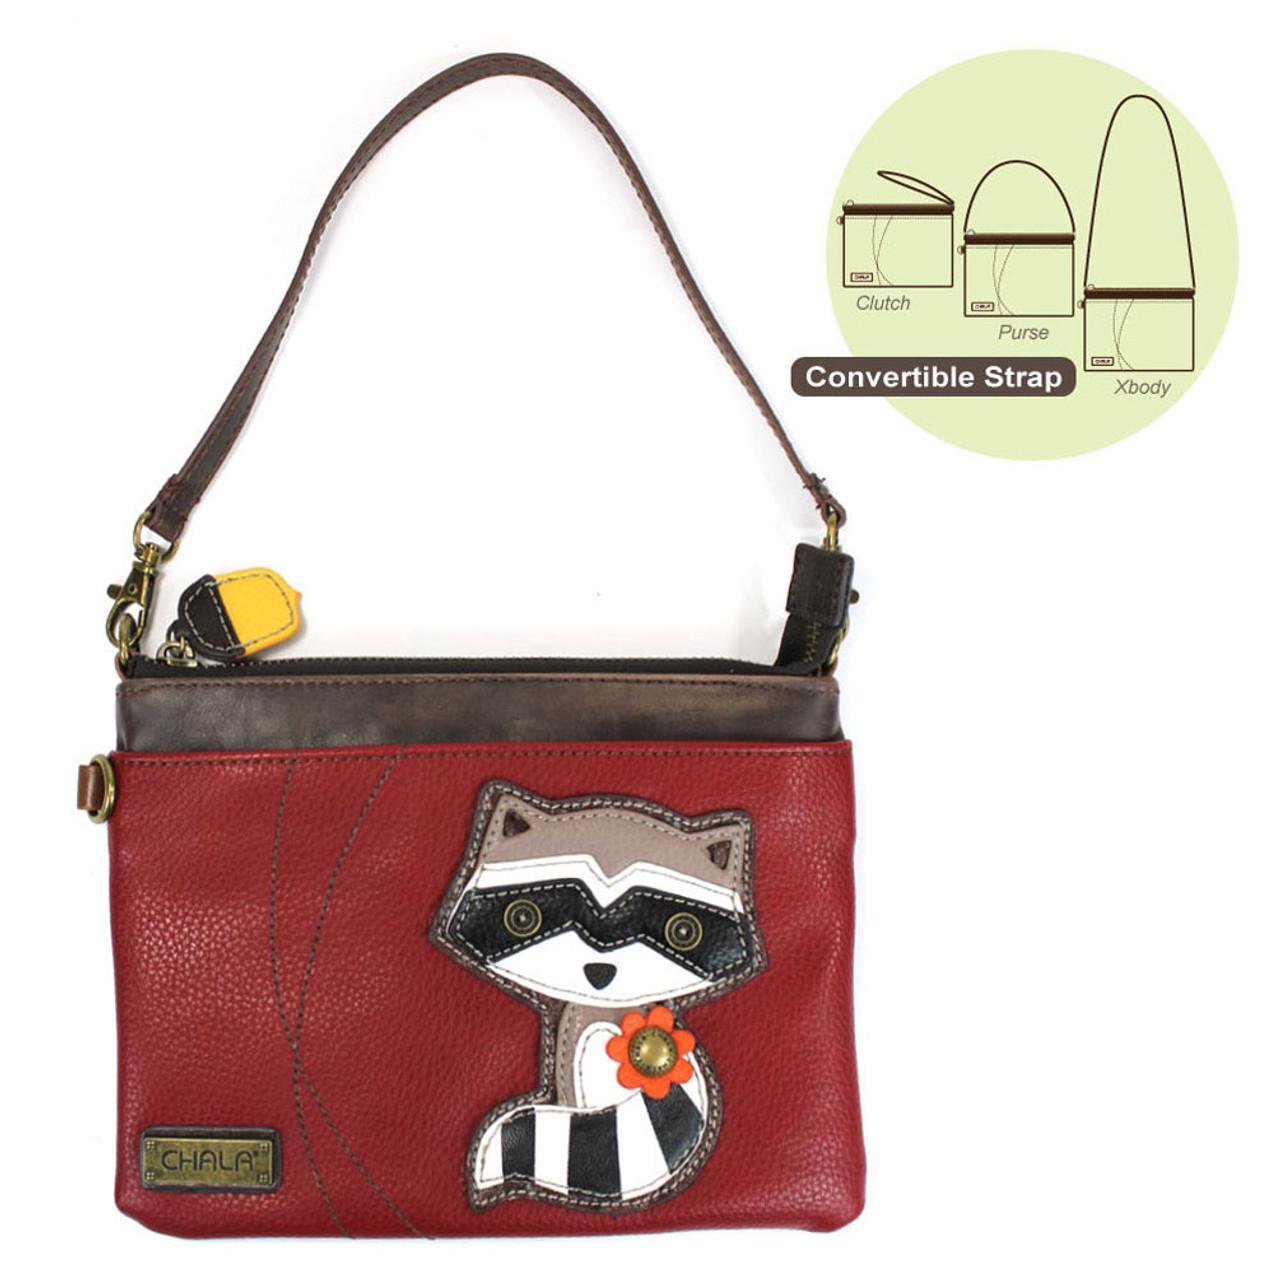 Navy Faux Leather Chala Handbags Mini Crossbody Clutch Purse Bag Red Cardinal